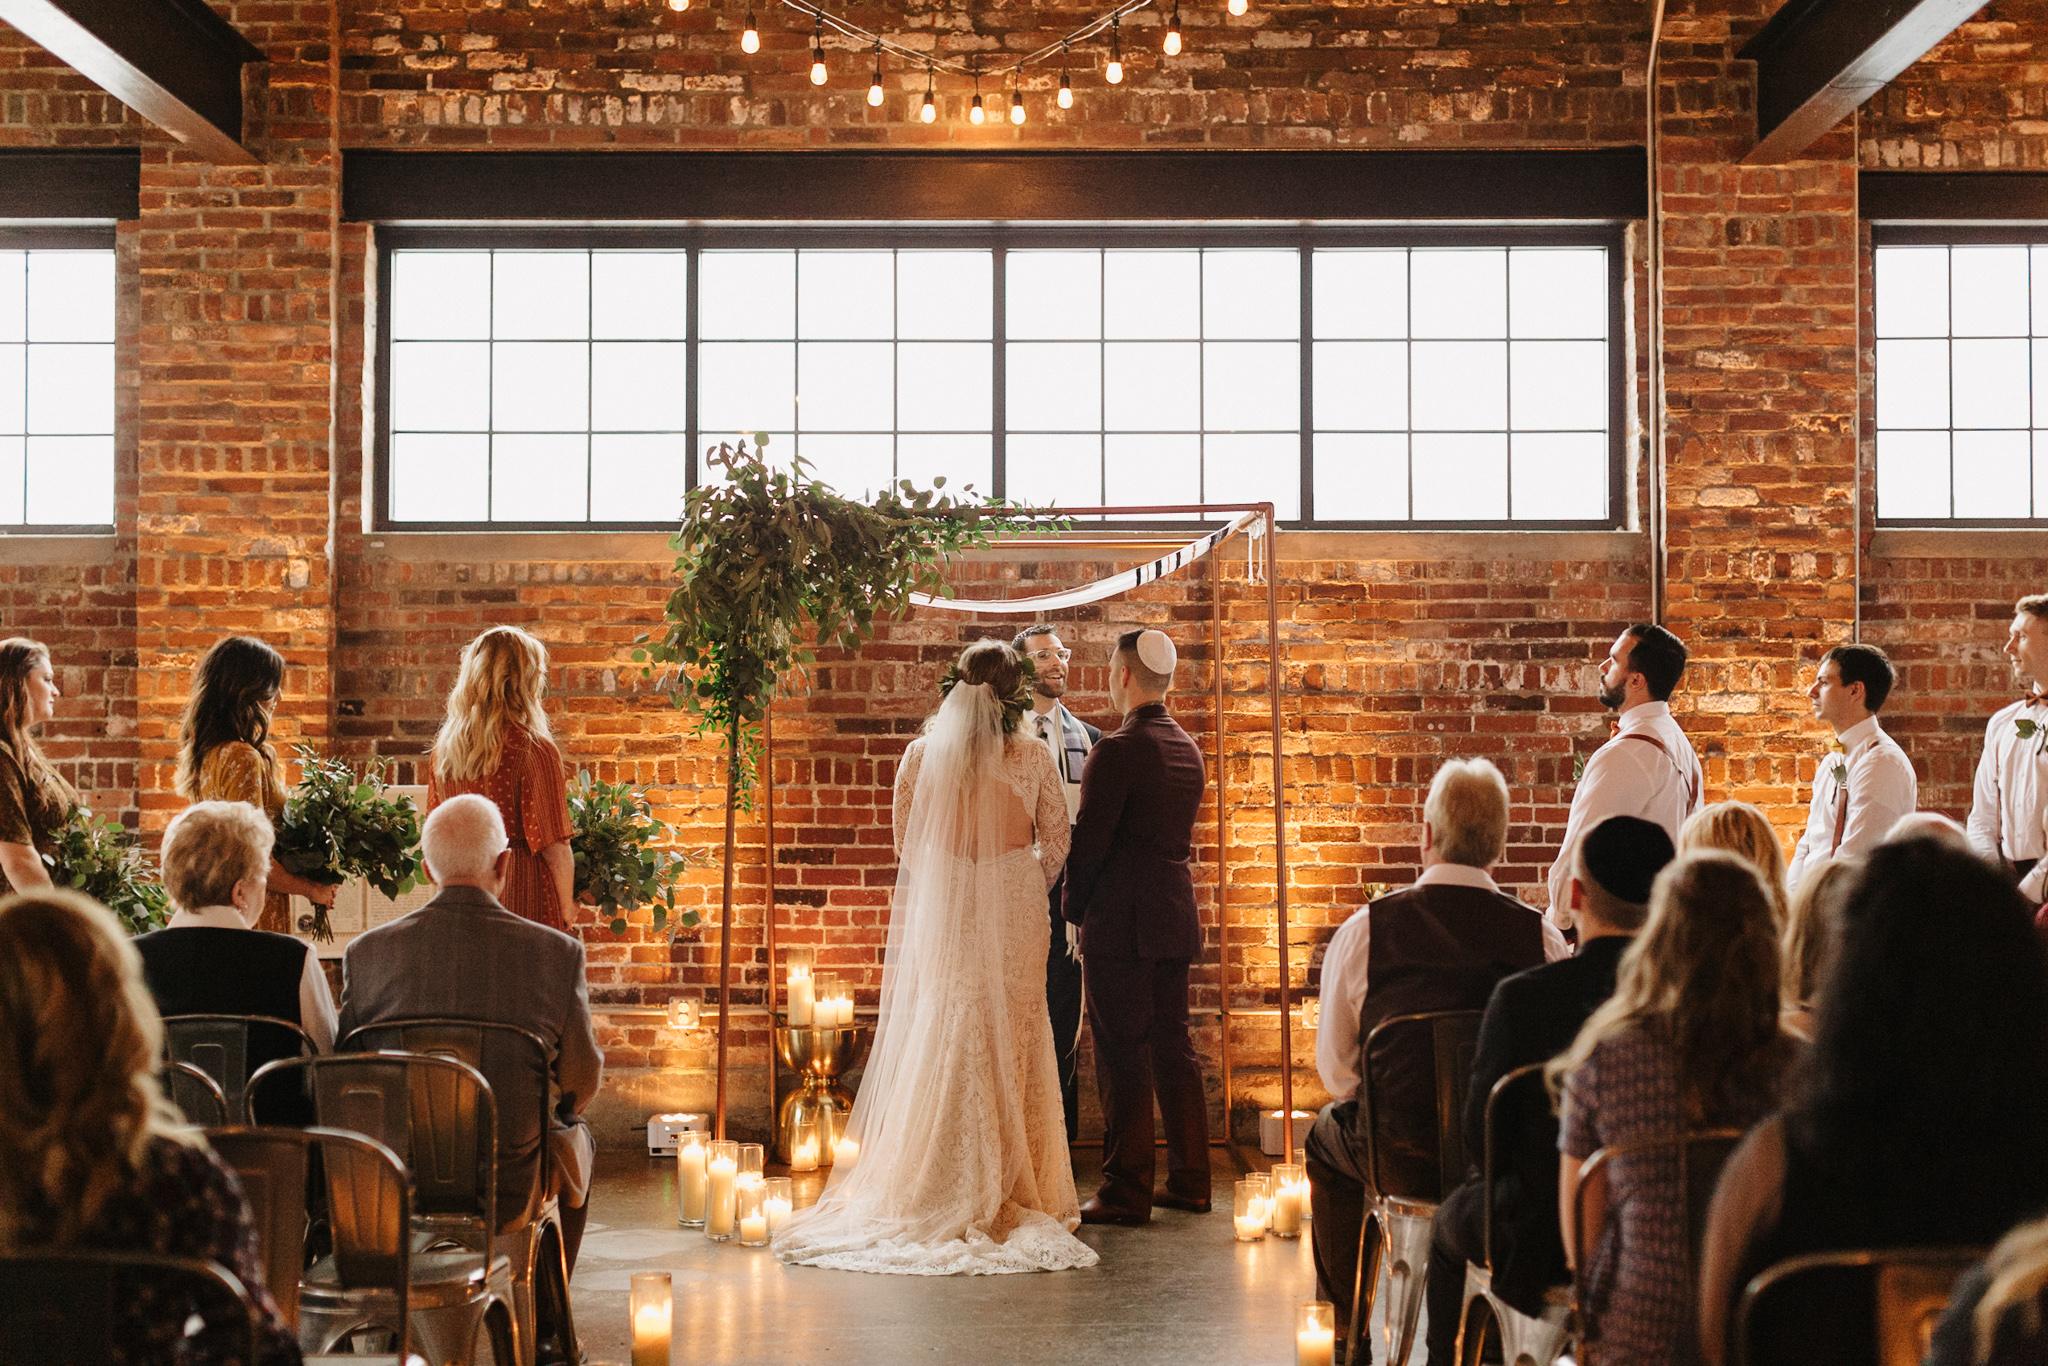 41_19-03-30 Caylen and Max Wedding Previews-82.jpg